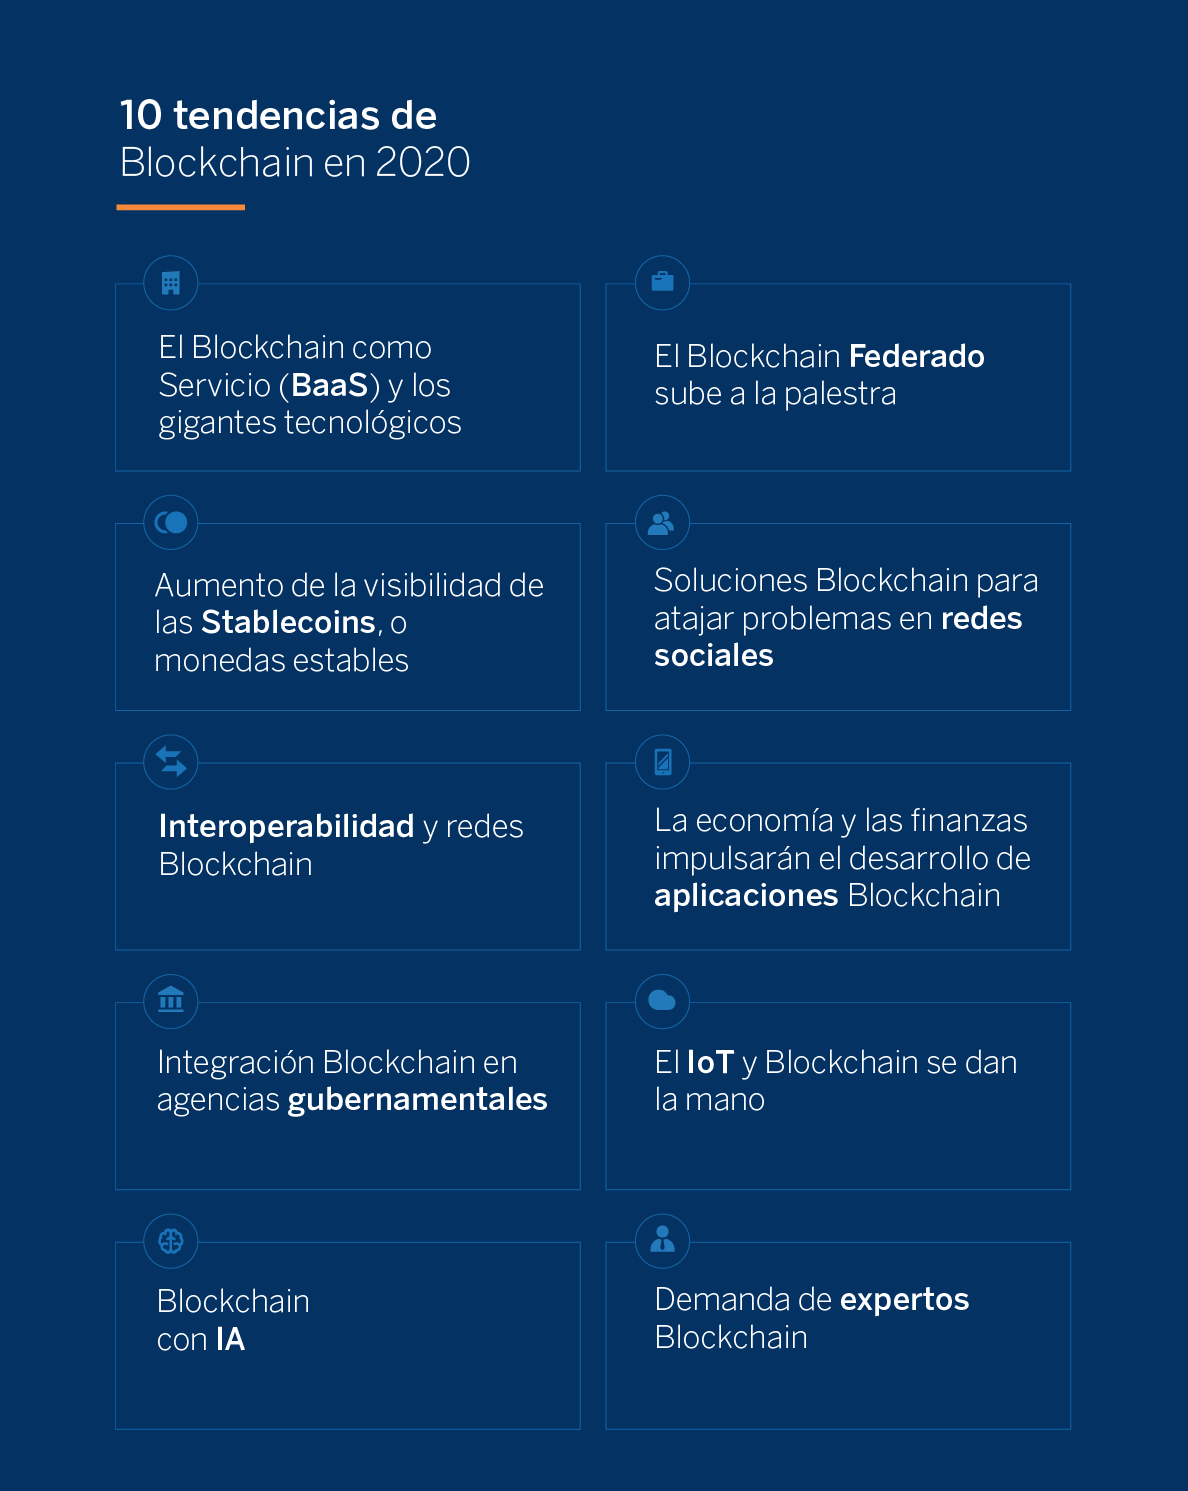 BBVA-OpenMind-2020 tendencias Blockchain